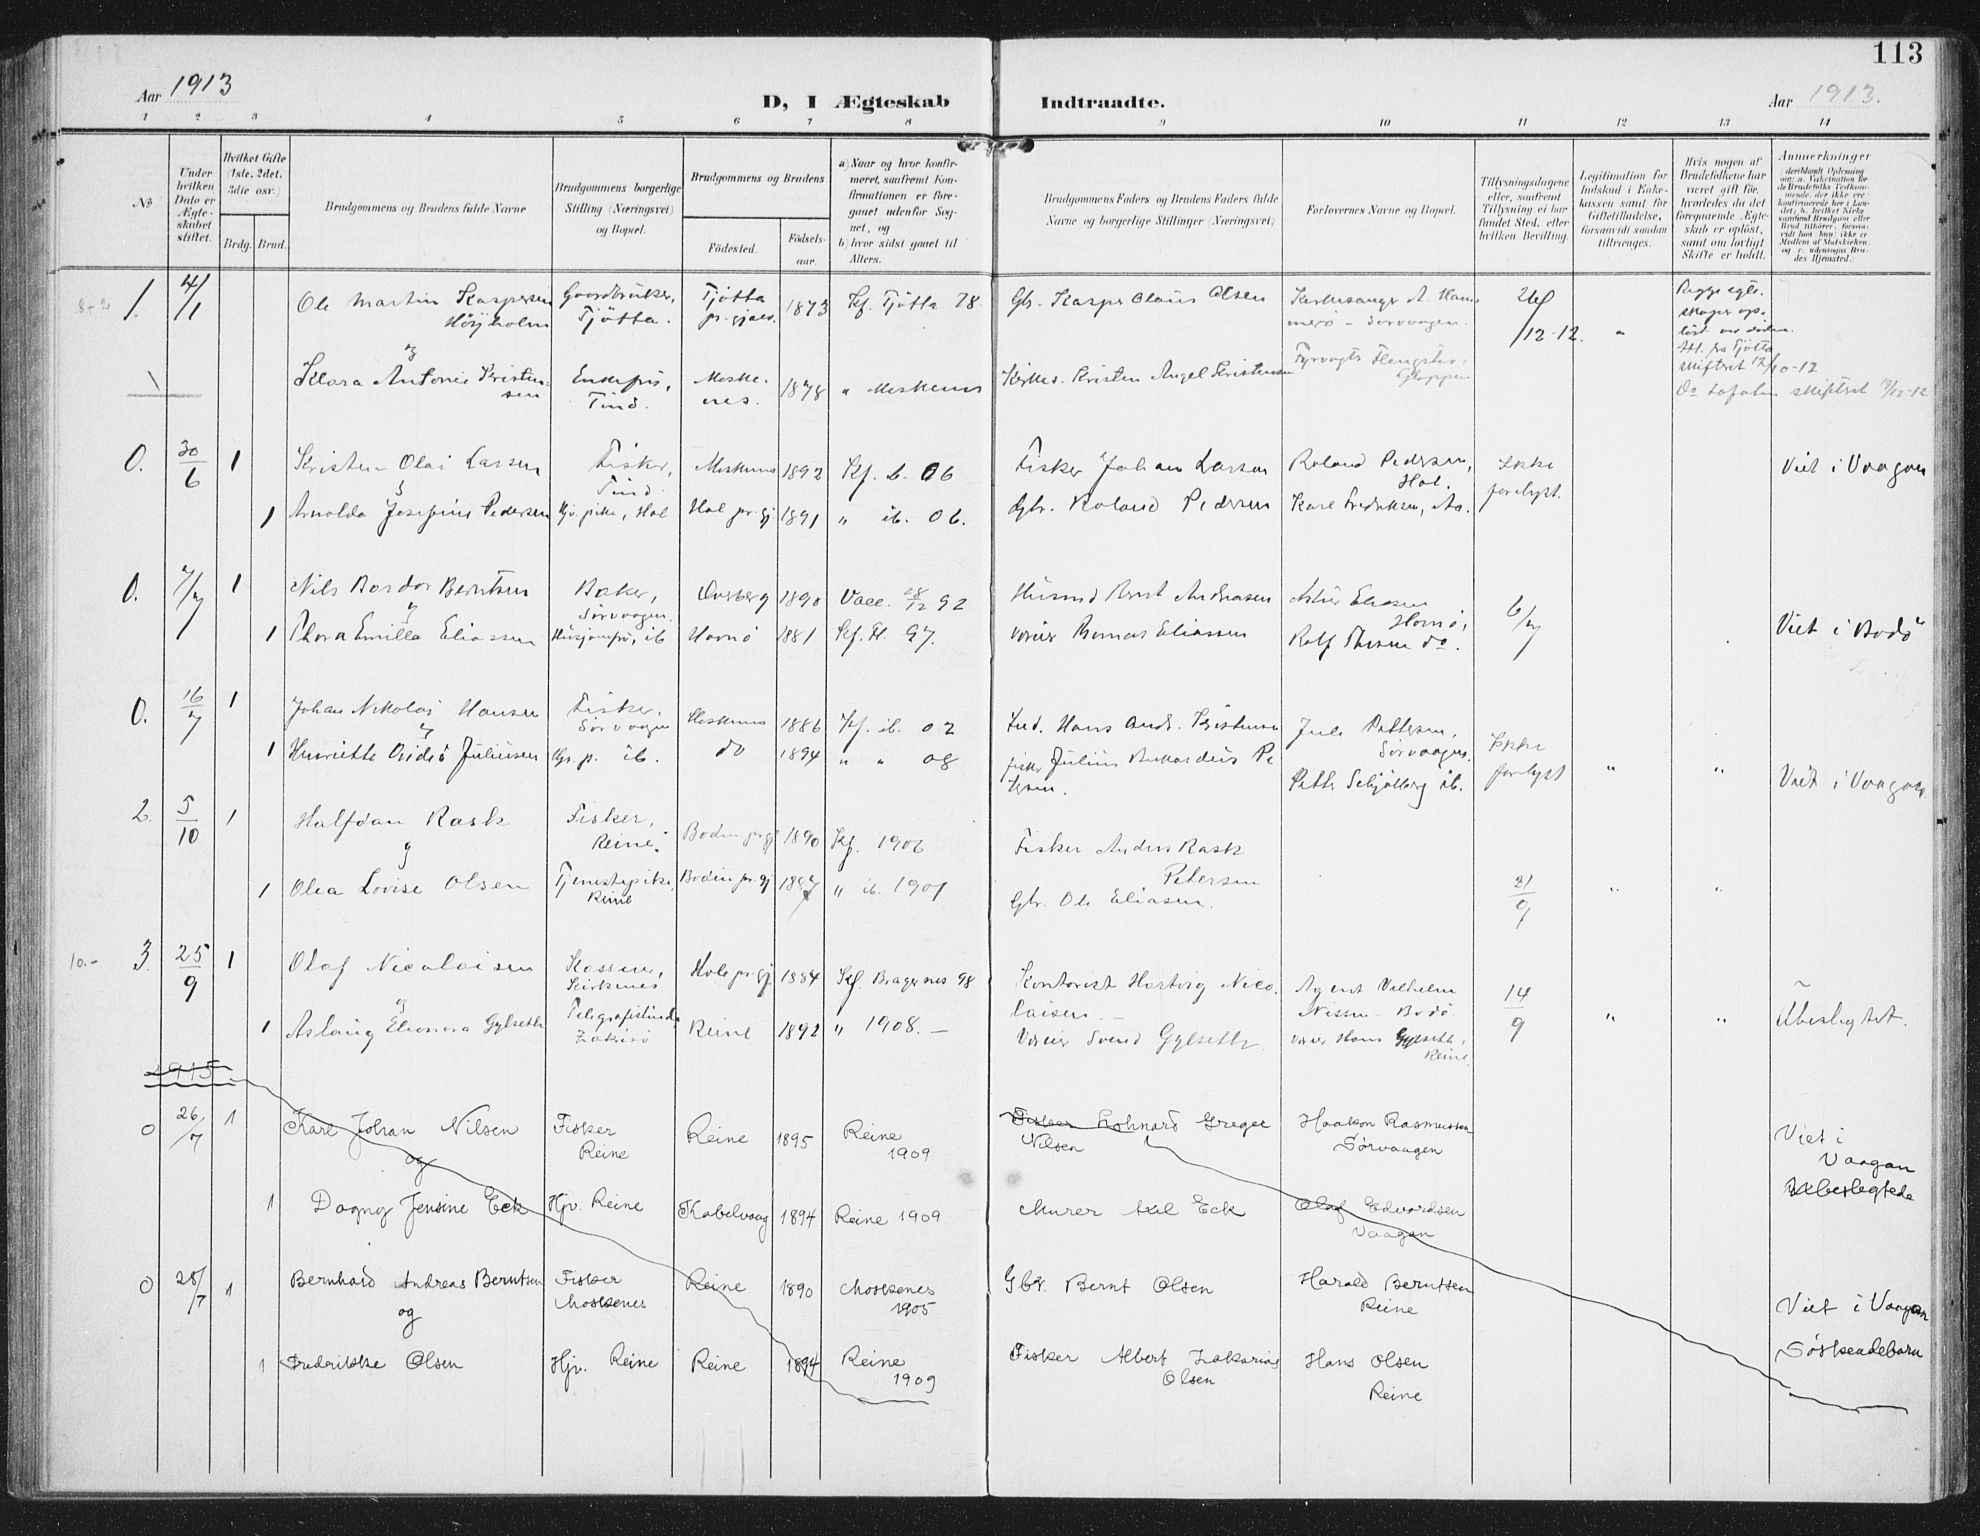 SAT, Ministerialprotokoller, klokkerbøker og fødselsregistre - Nordland, 886/L1221: Ministerialbok nr. 886A03, 1903-1913, s. 113